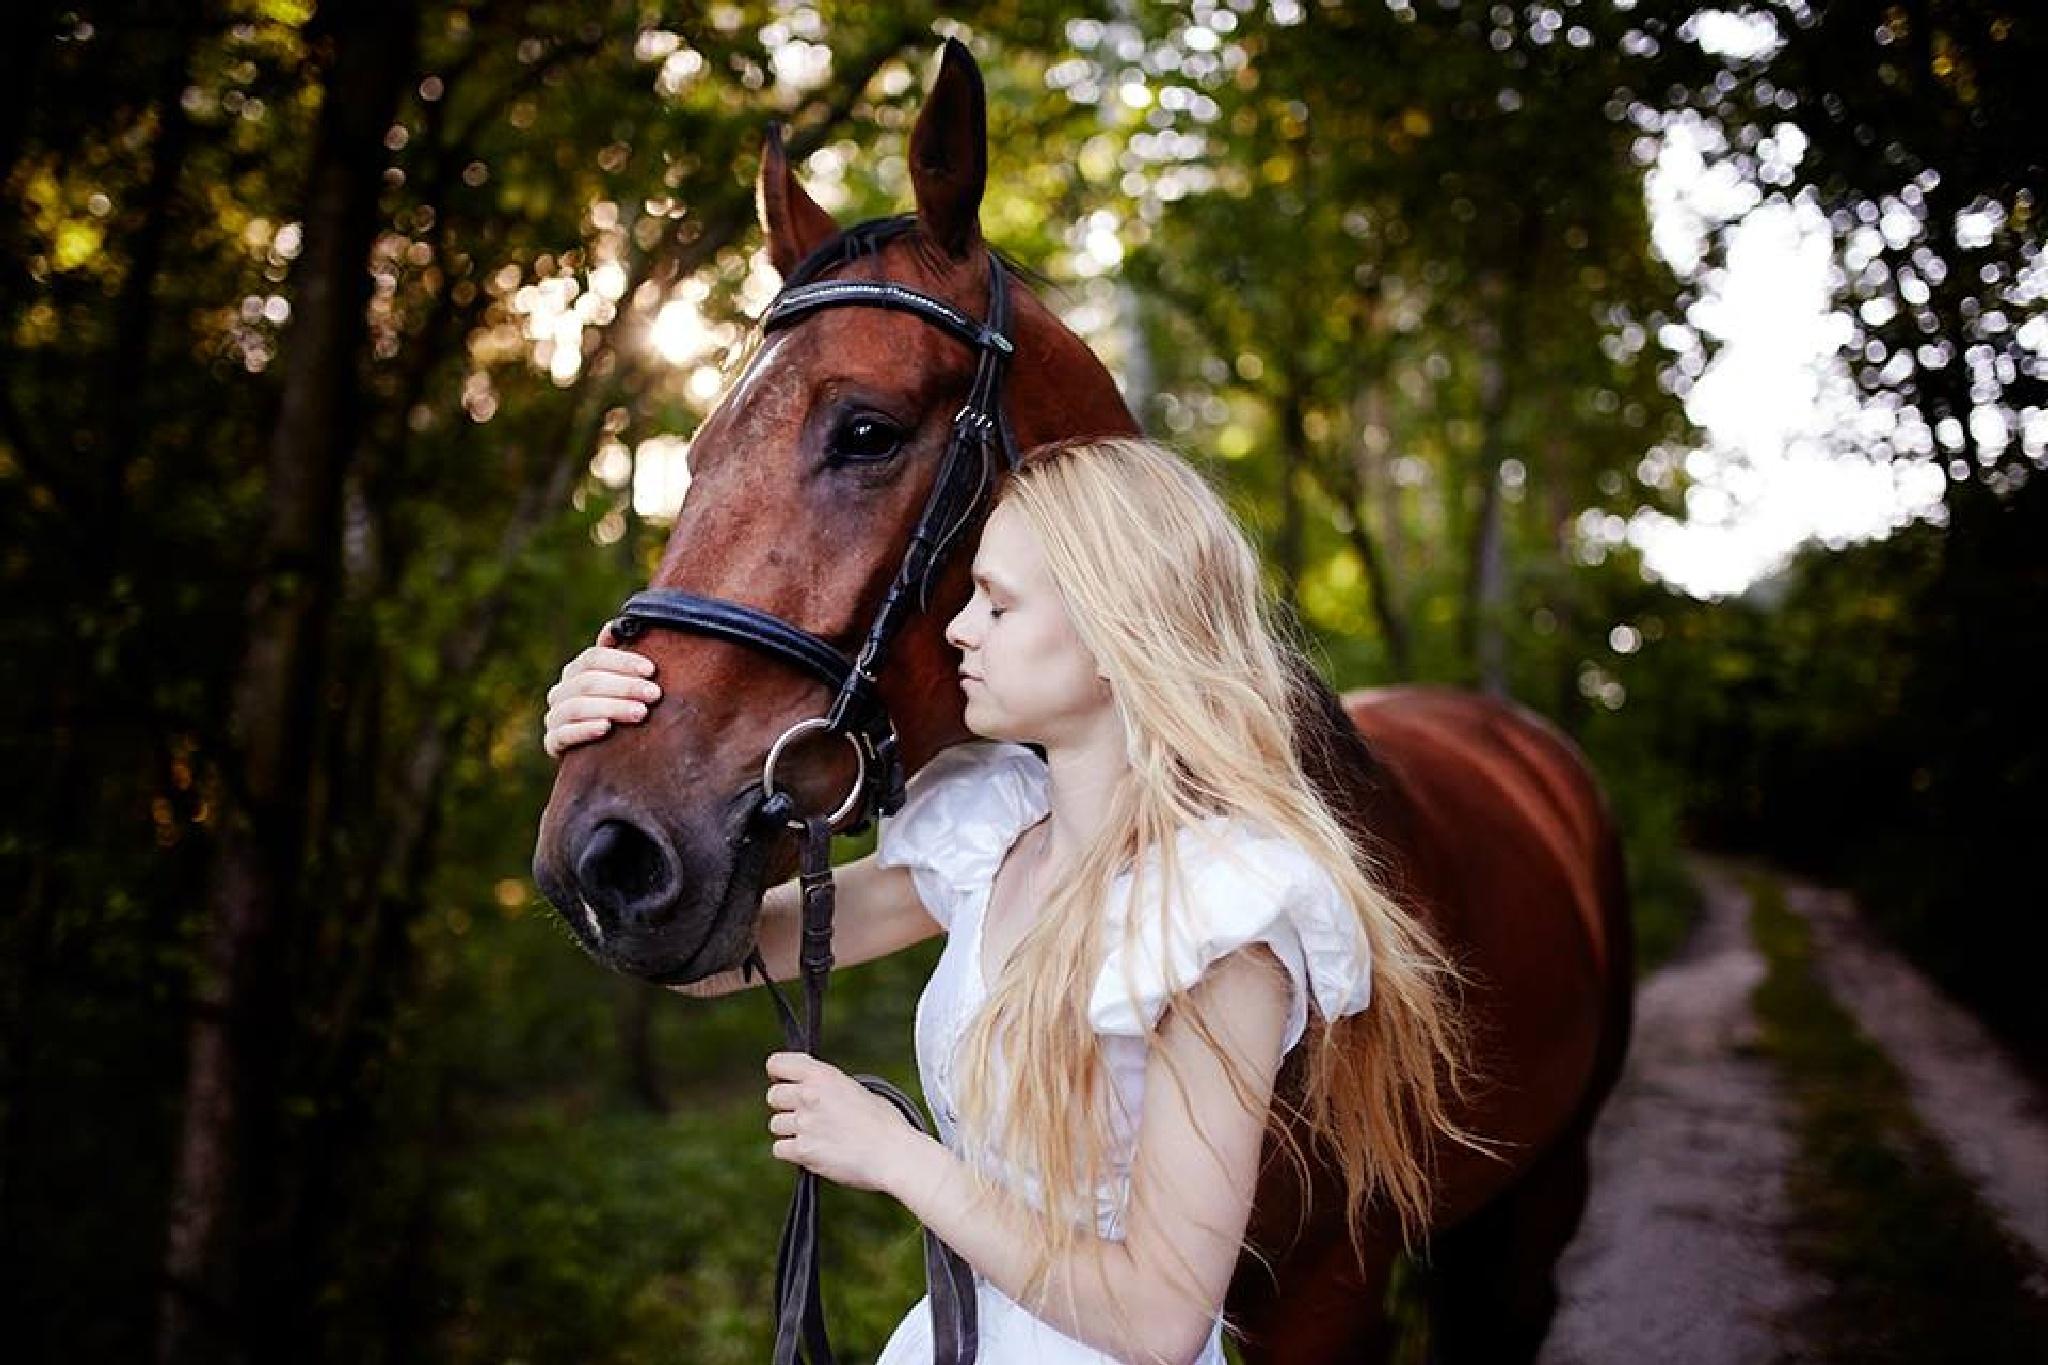 Love II by Justyna Matczak Kubasiewicz